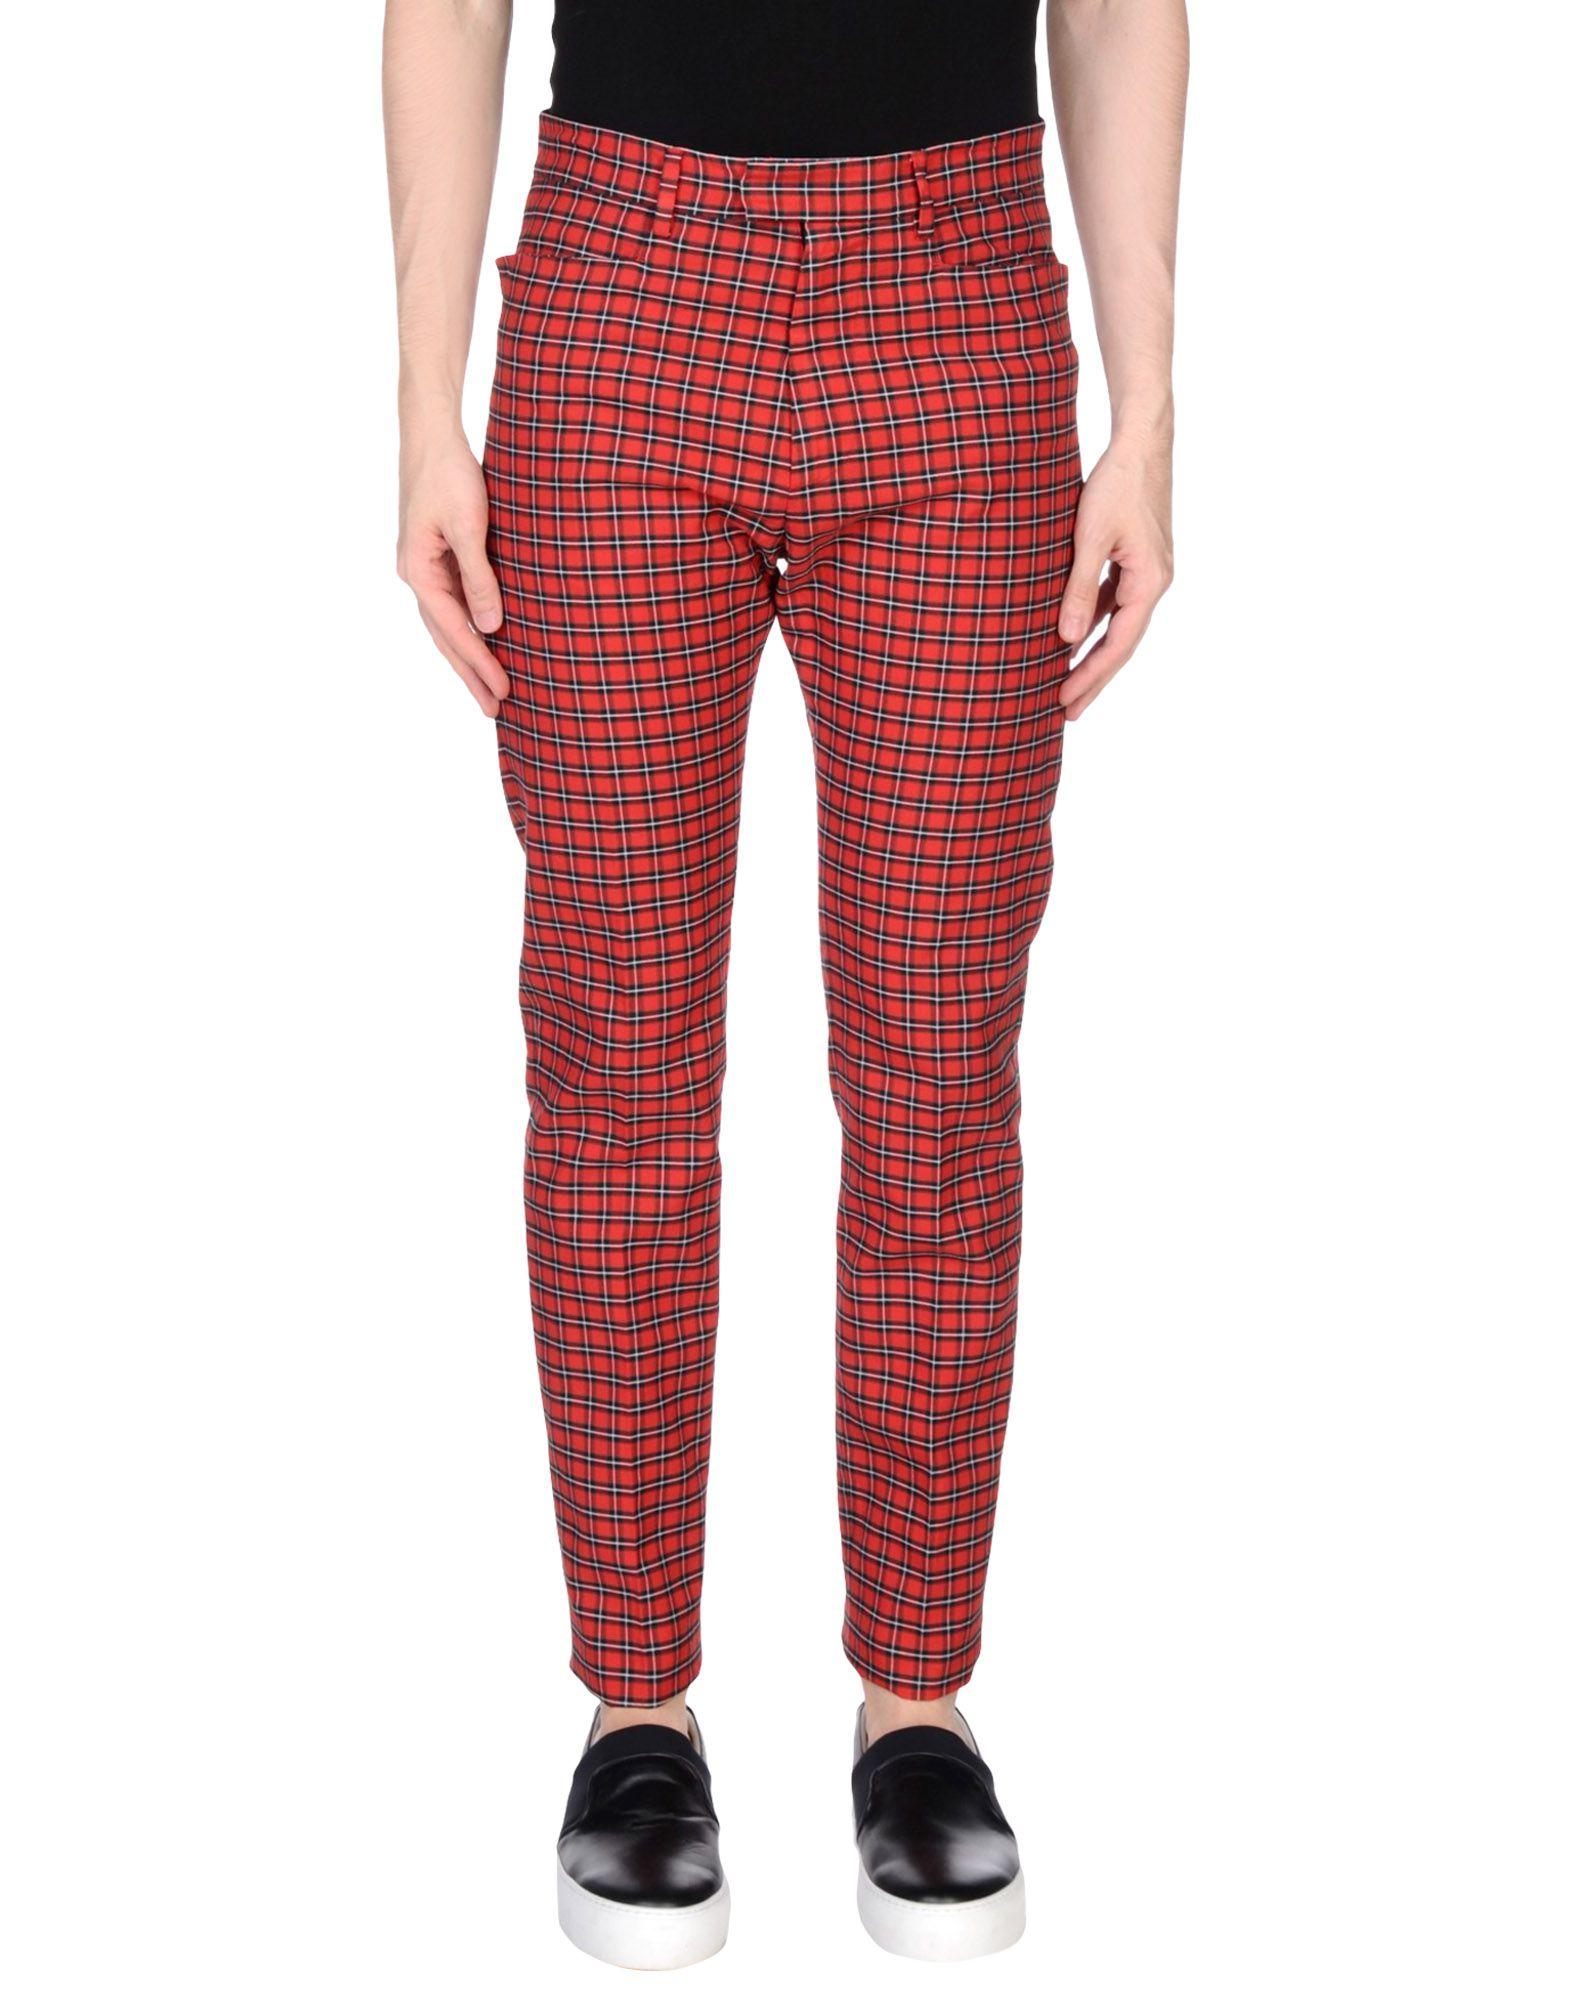 Pantalone Pantalone Dsquarosso2 uomo - 13091299AM  machen Rabattaktivitäten